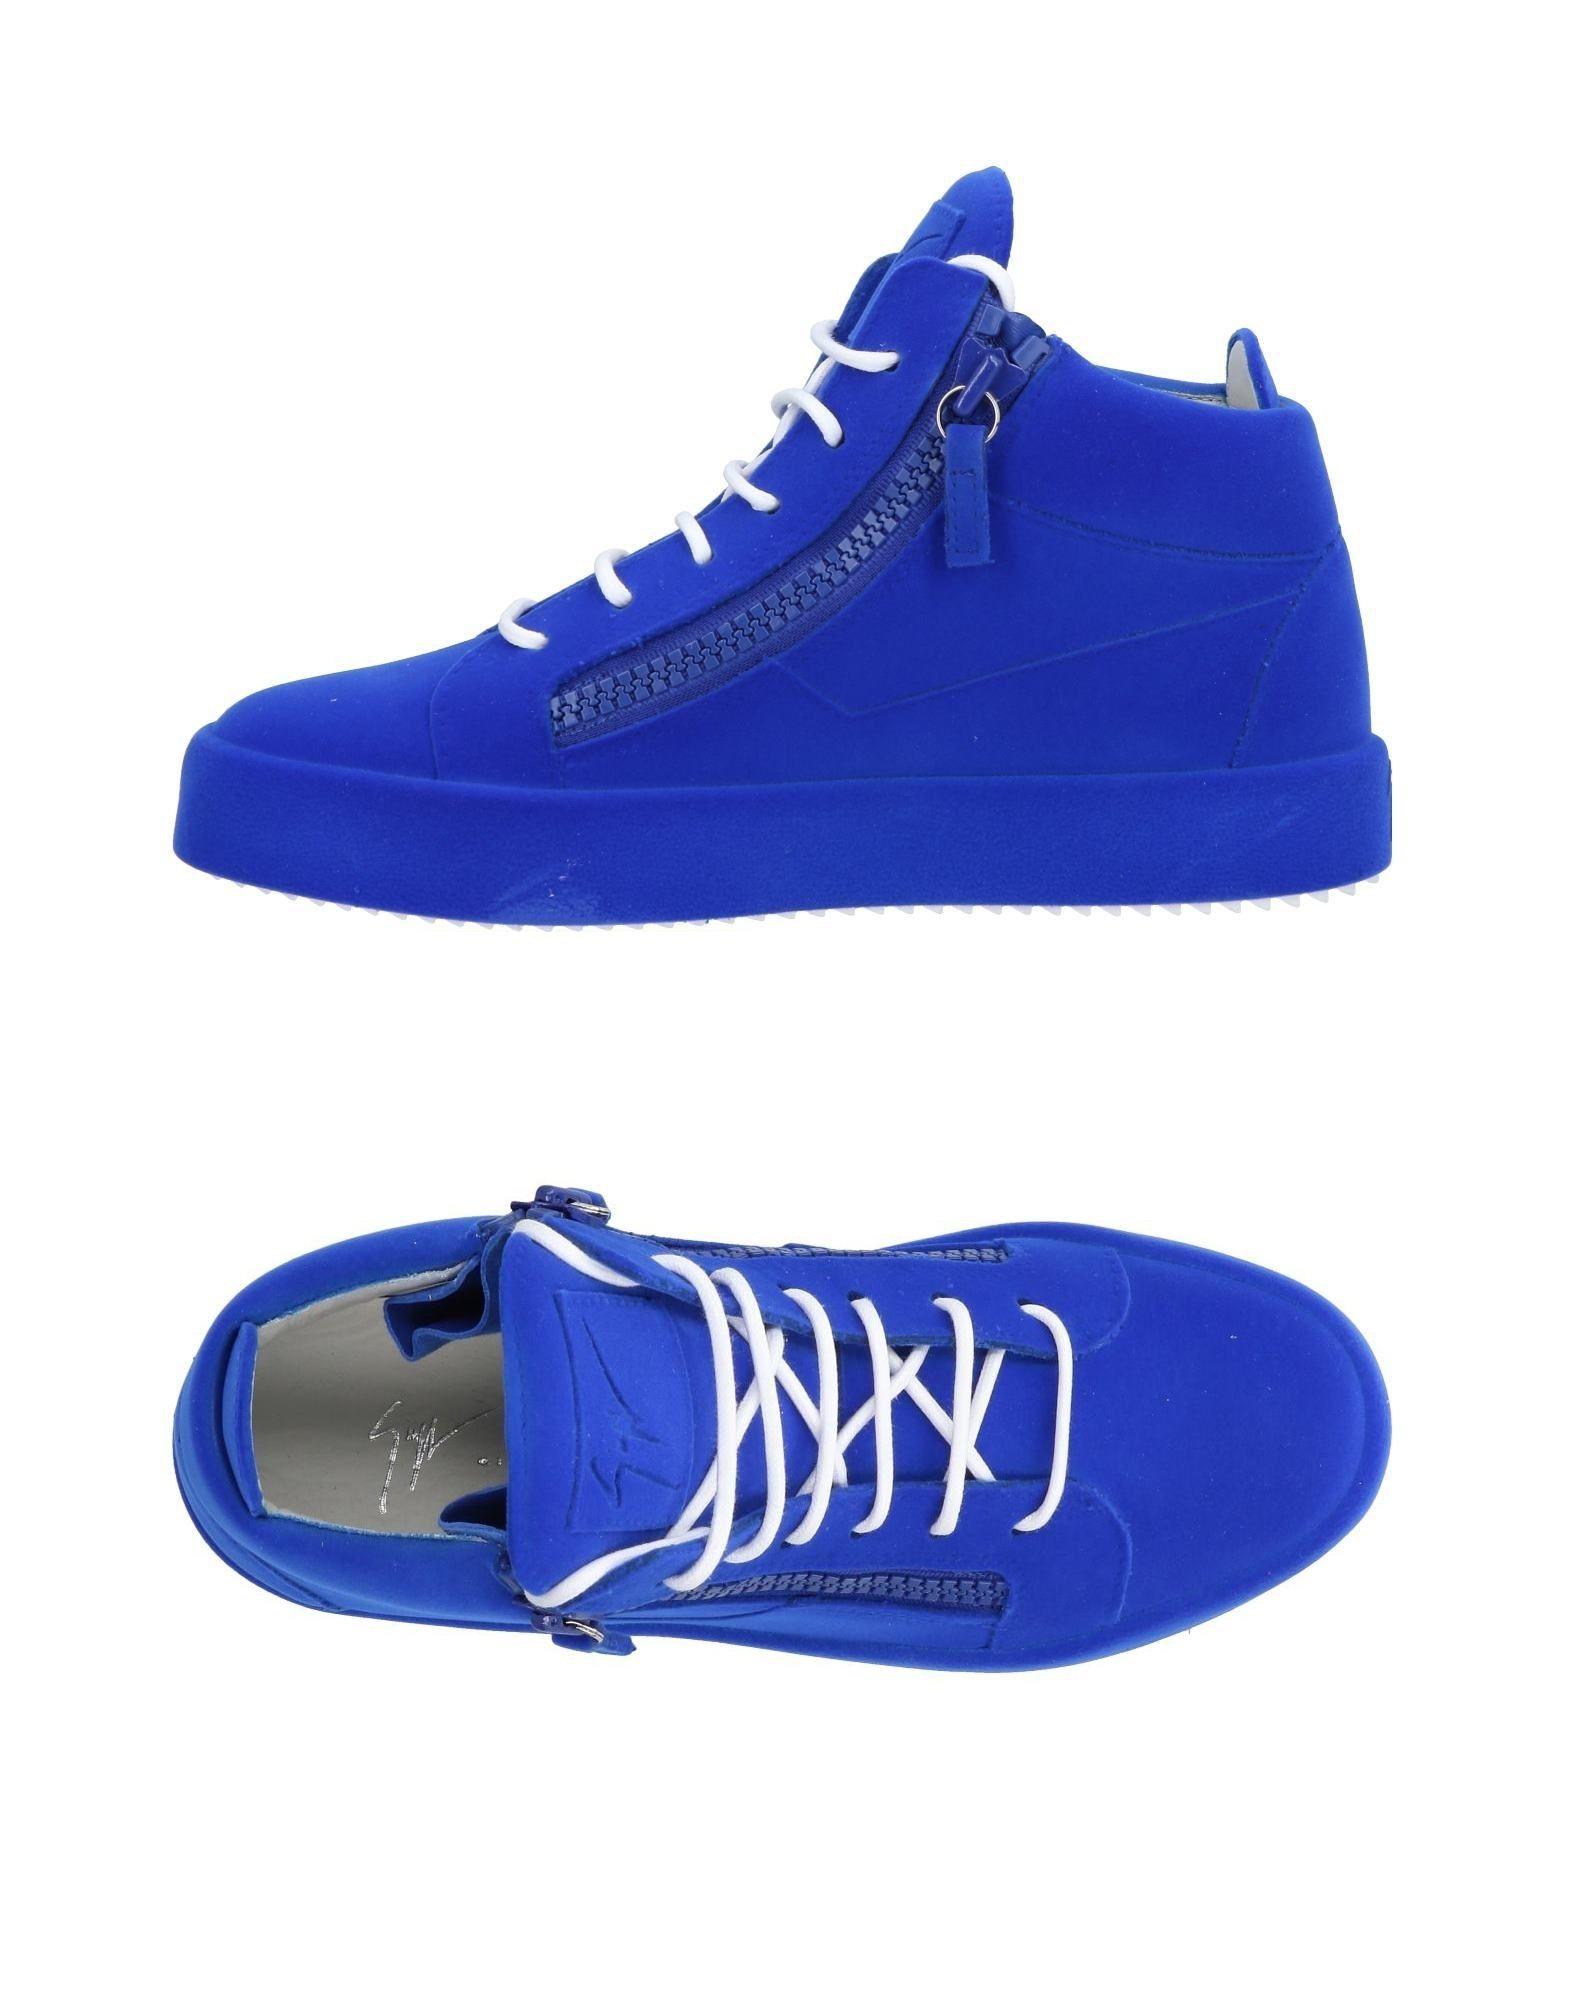 Giuseppe Zanotti Sneakers Herren  11463775GK Gute Qualität beliebte Schuhe